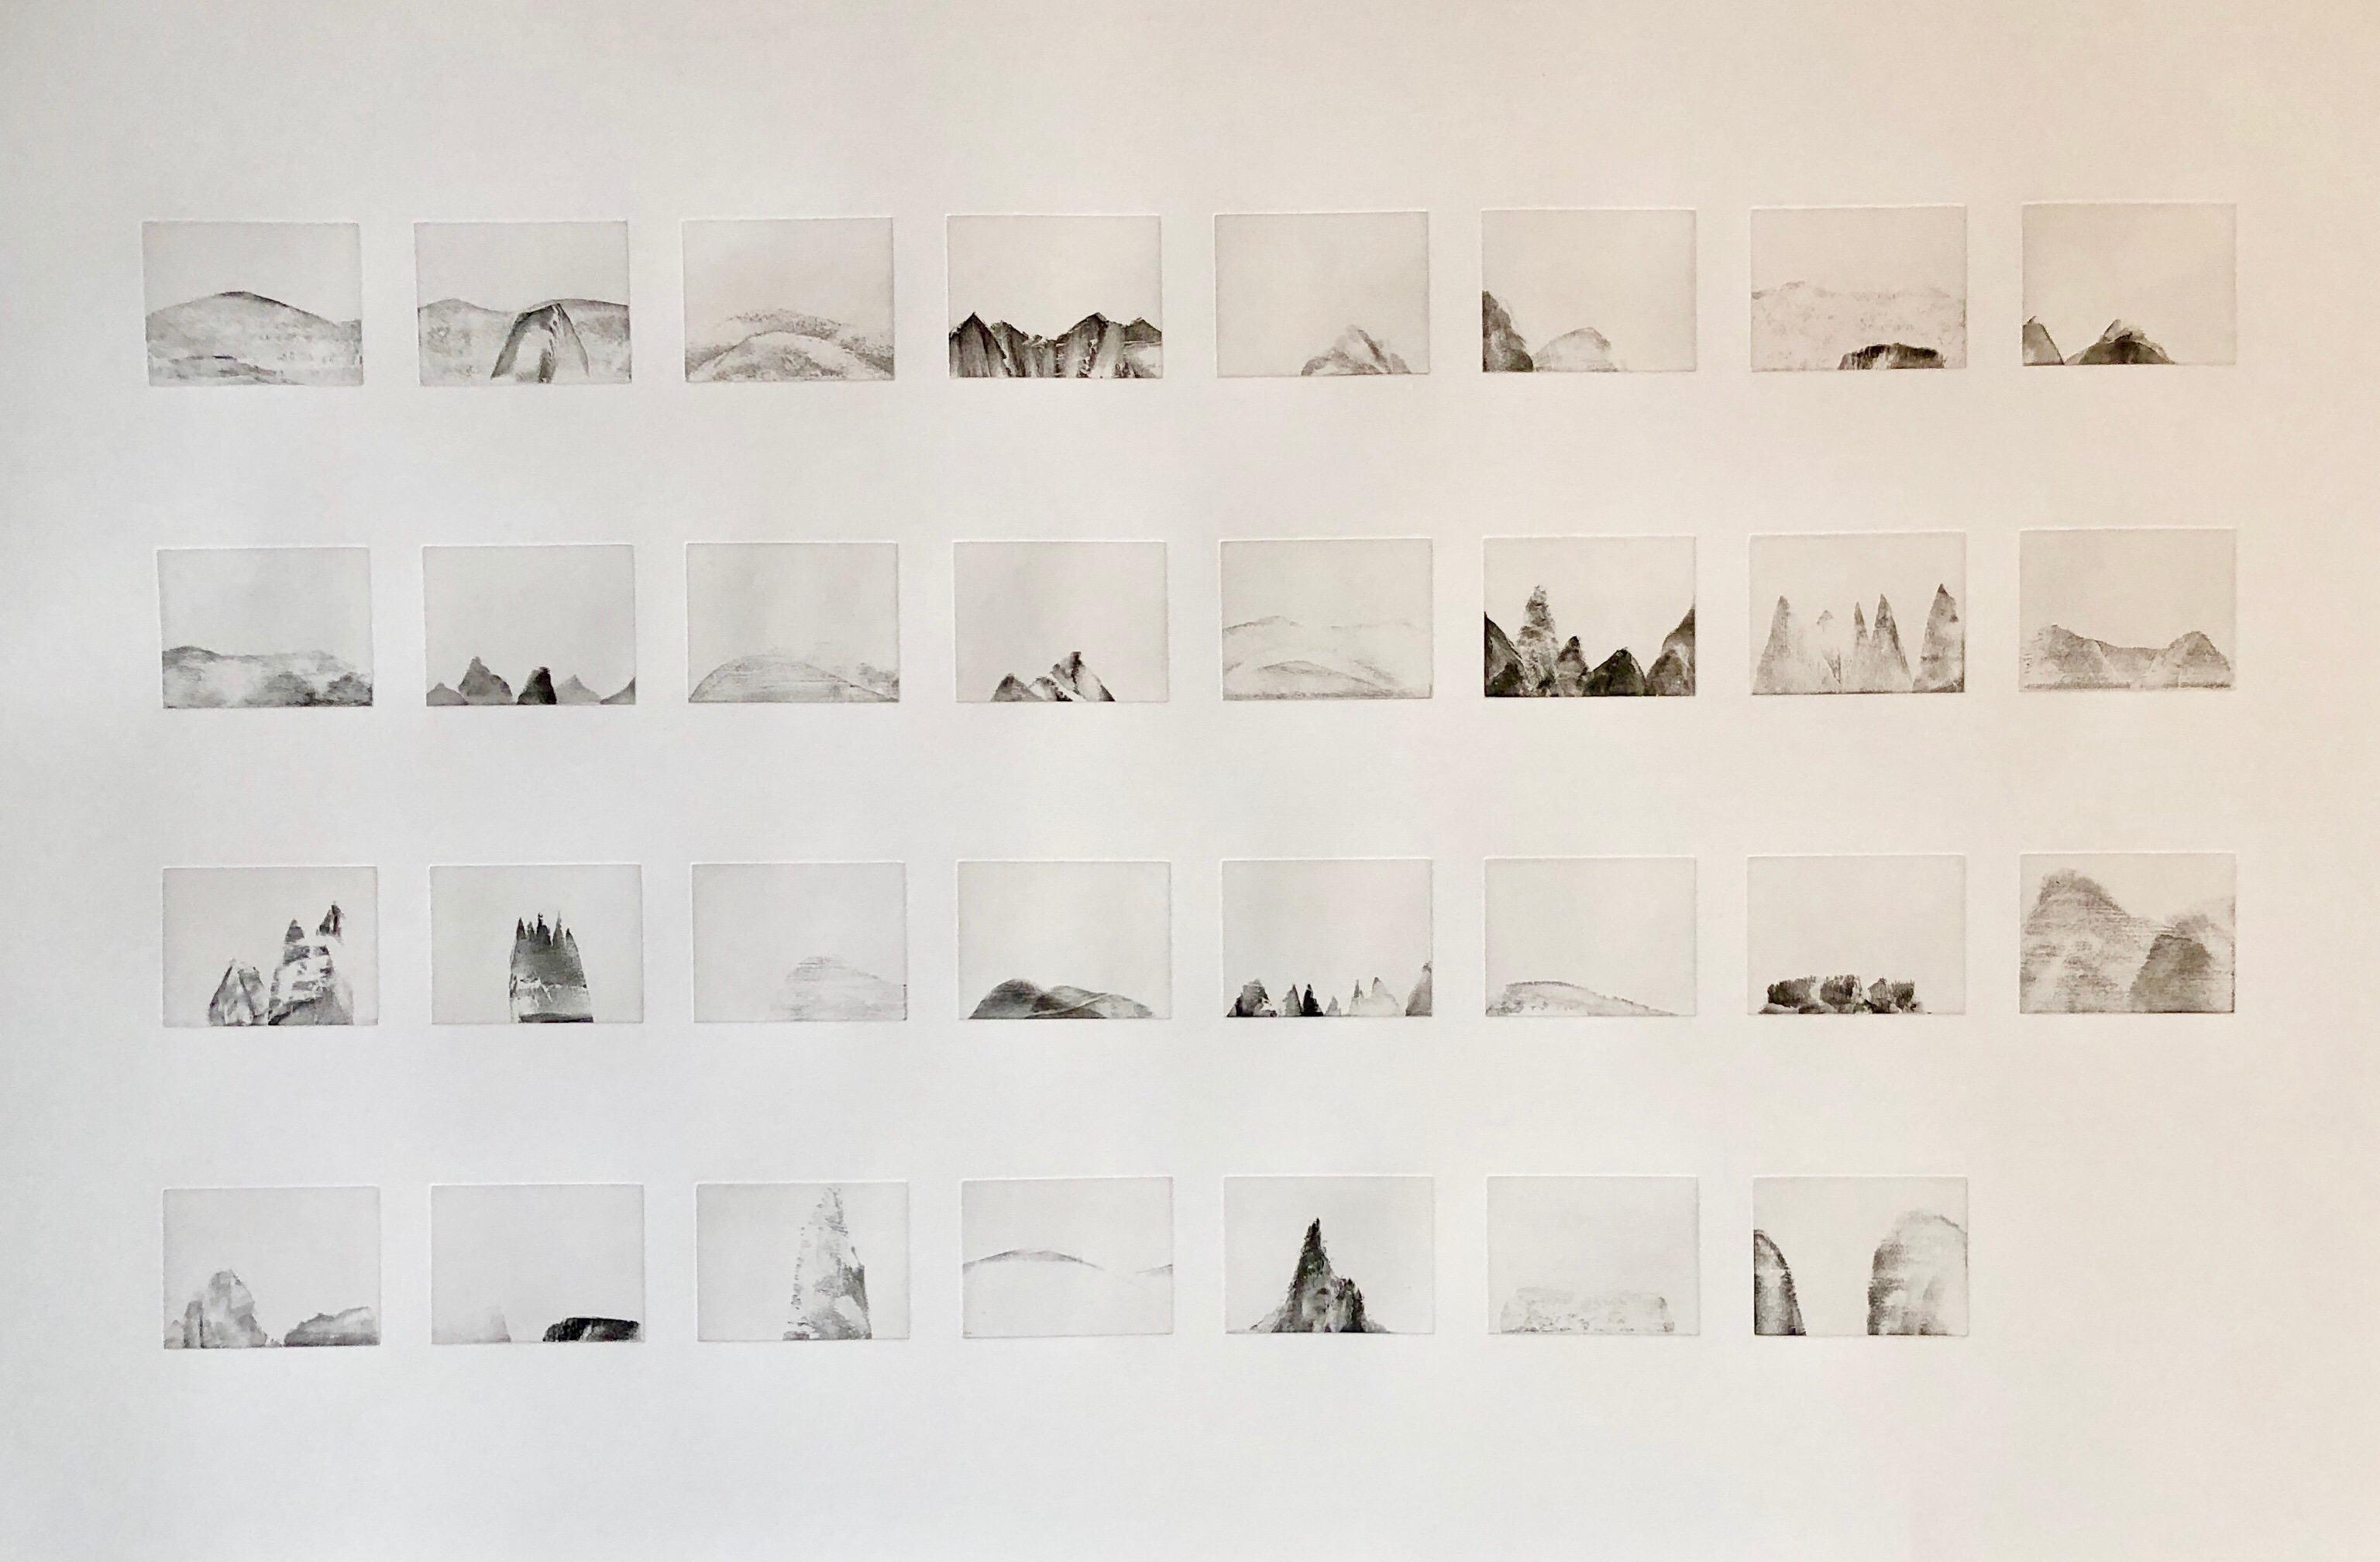 MOUNTAINS, 31 Etchings Printed 1 sheet, Large Art Etching French American Artist